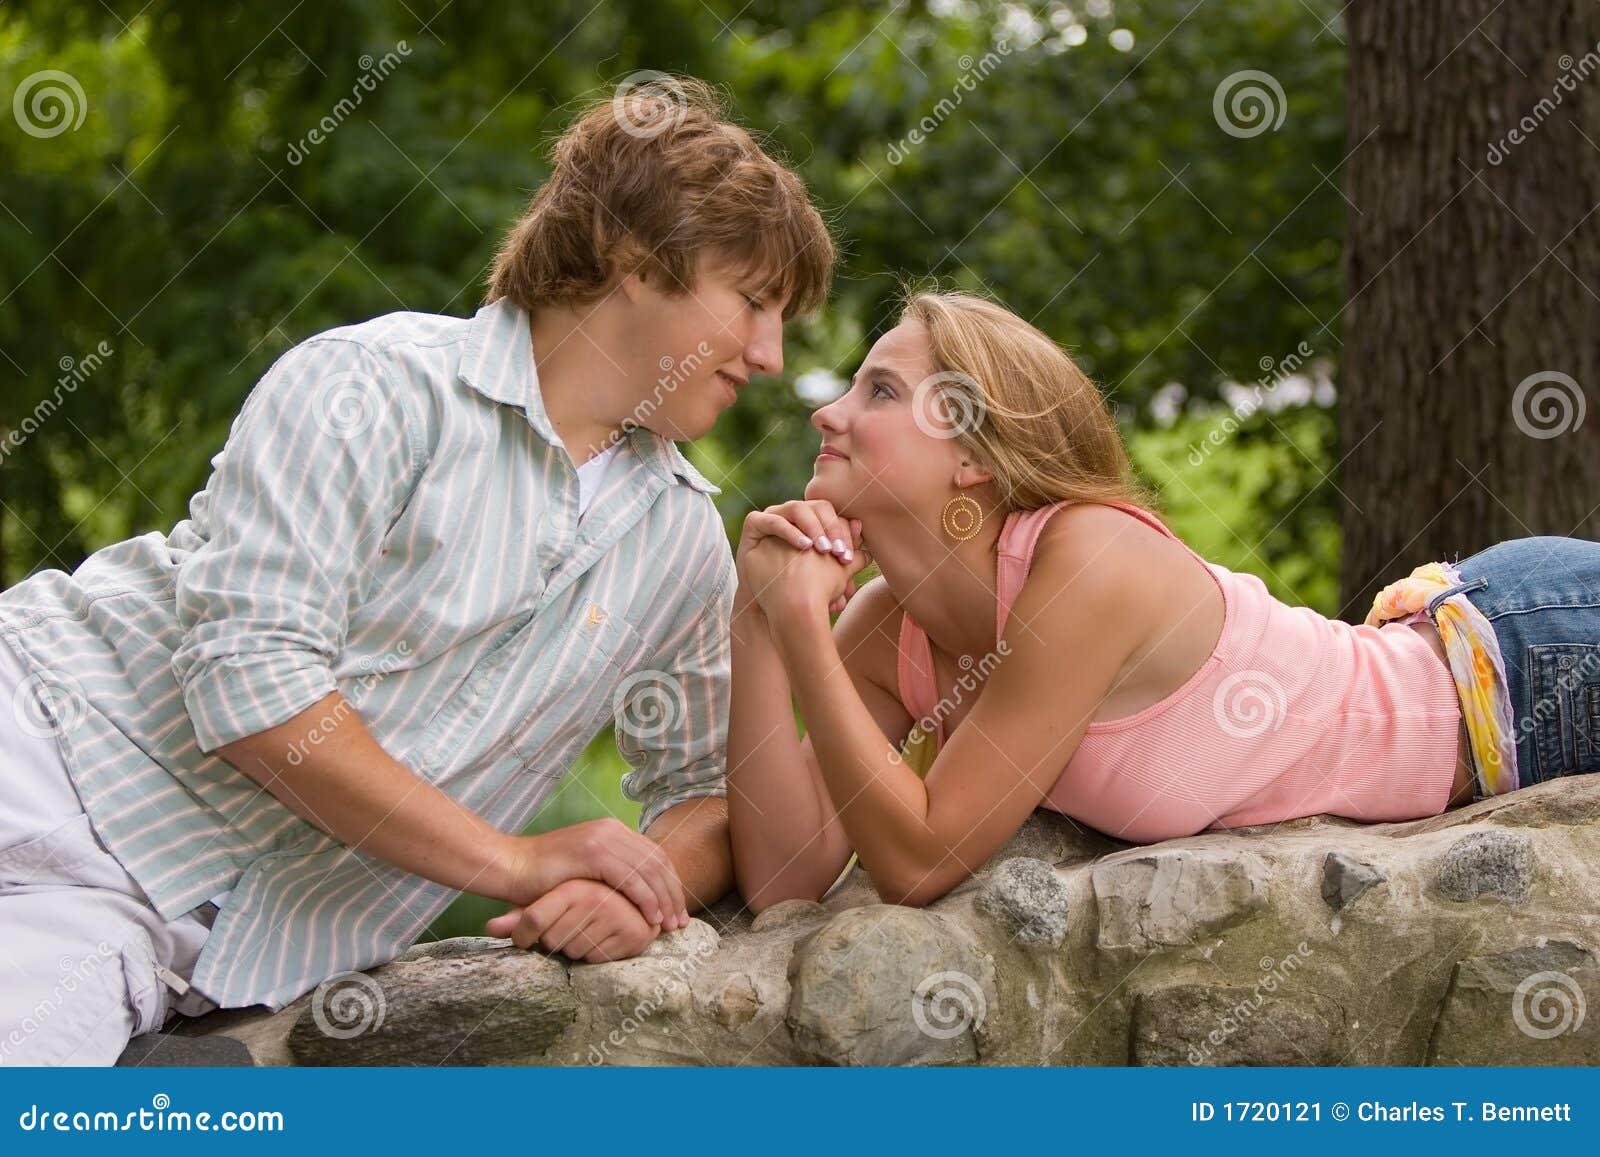 Apostolic dating websites